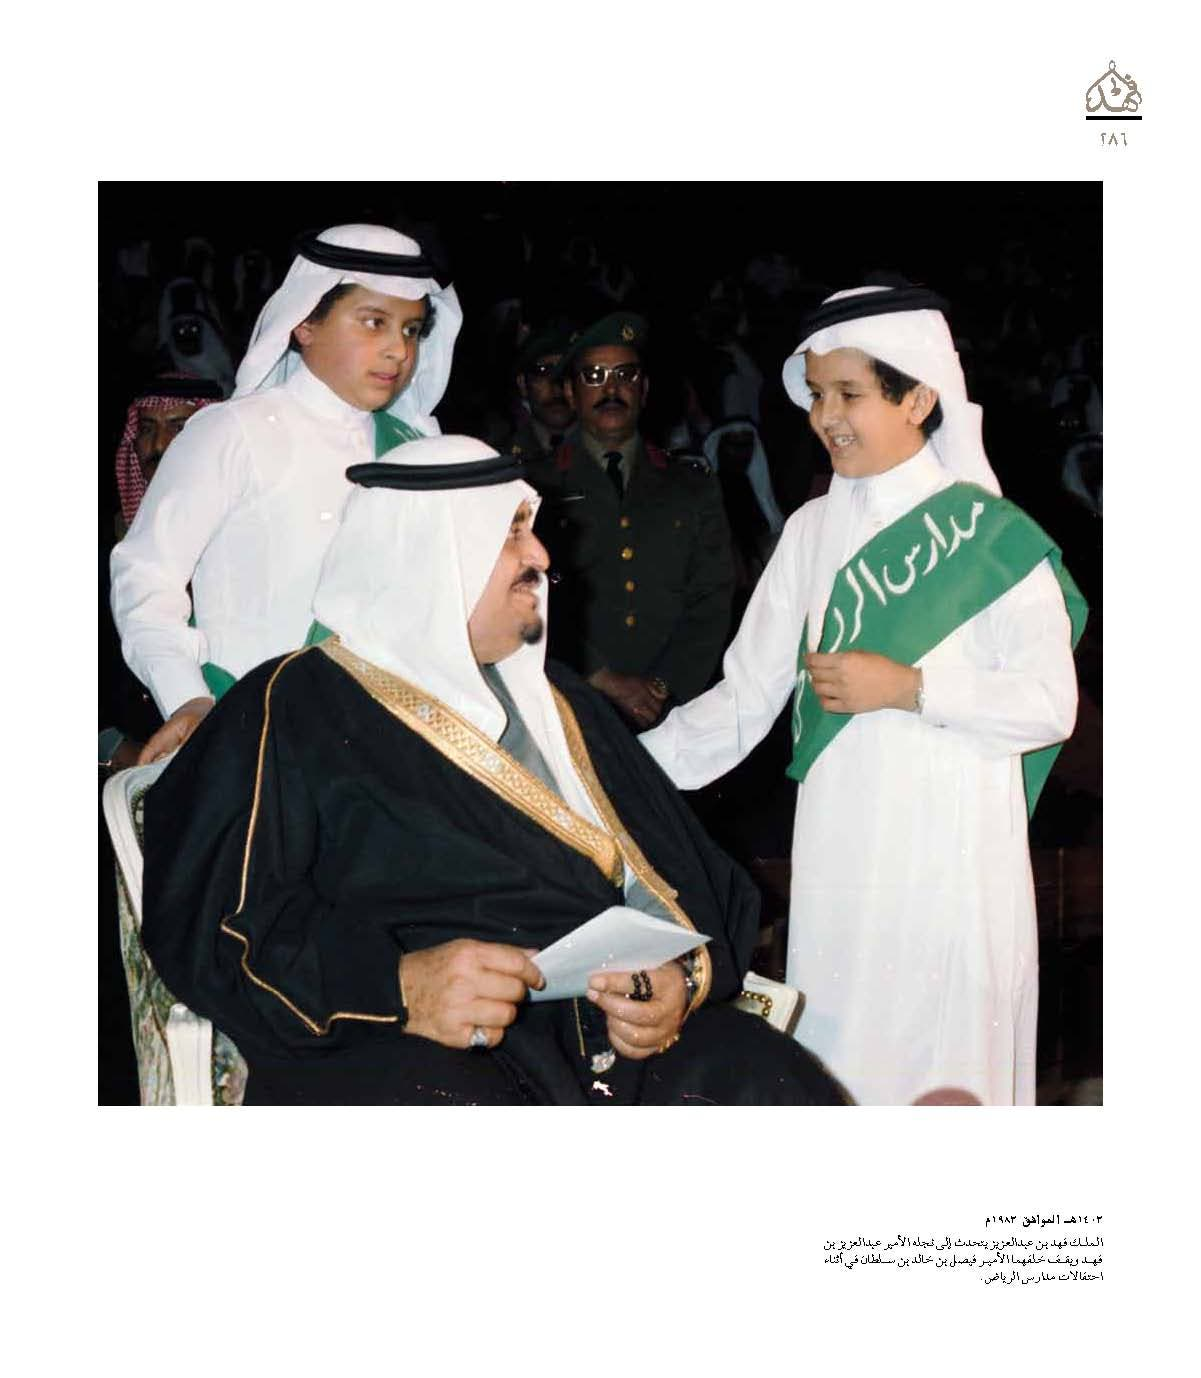 "صور نادرة للملك فهد في ""كتاب"" 0755ec2a-87af-41a4-bf2f-8b1de008e89b"